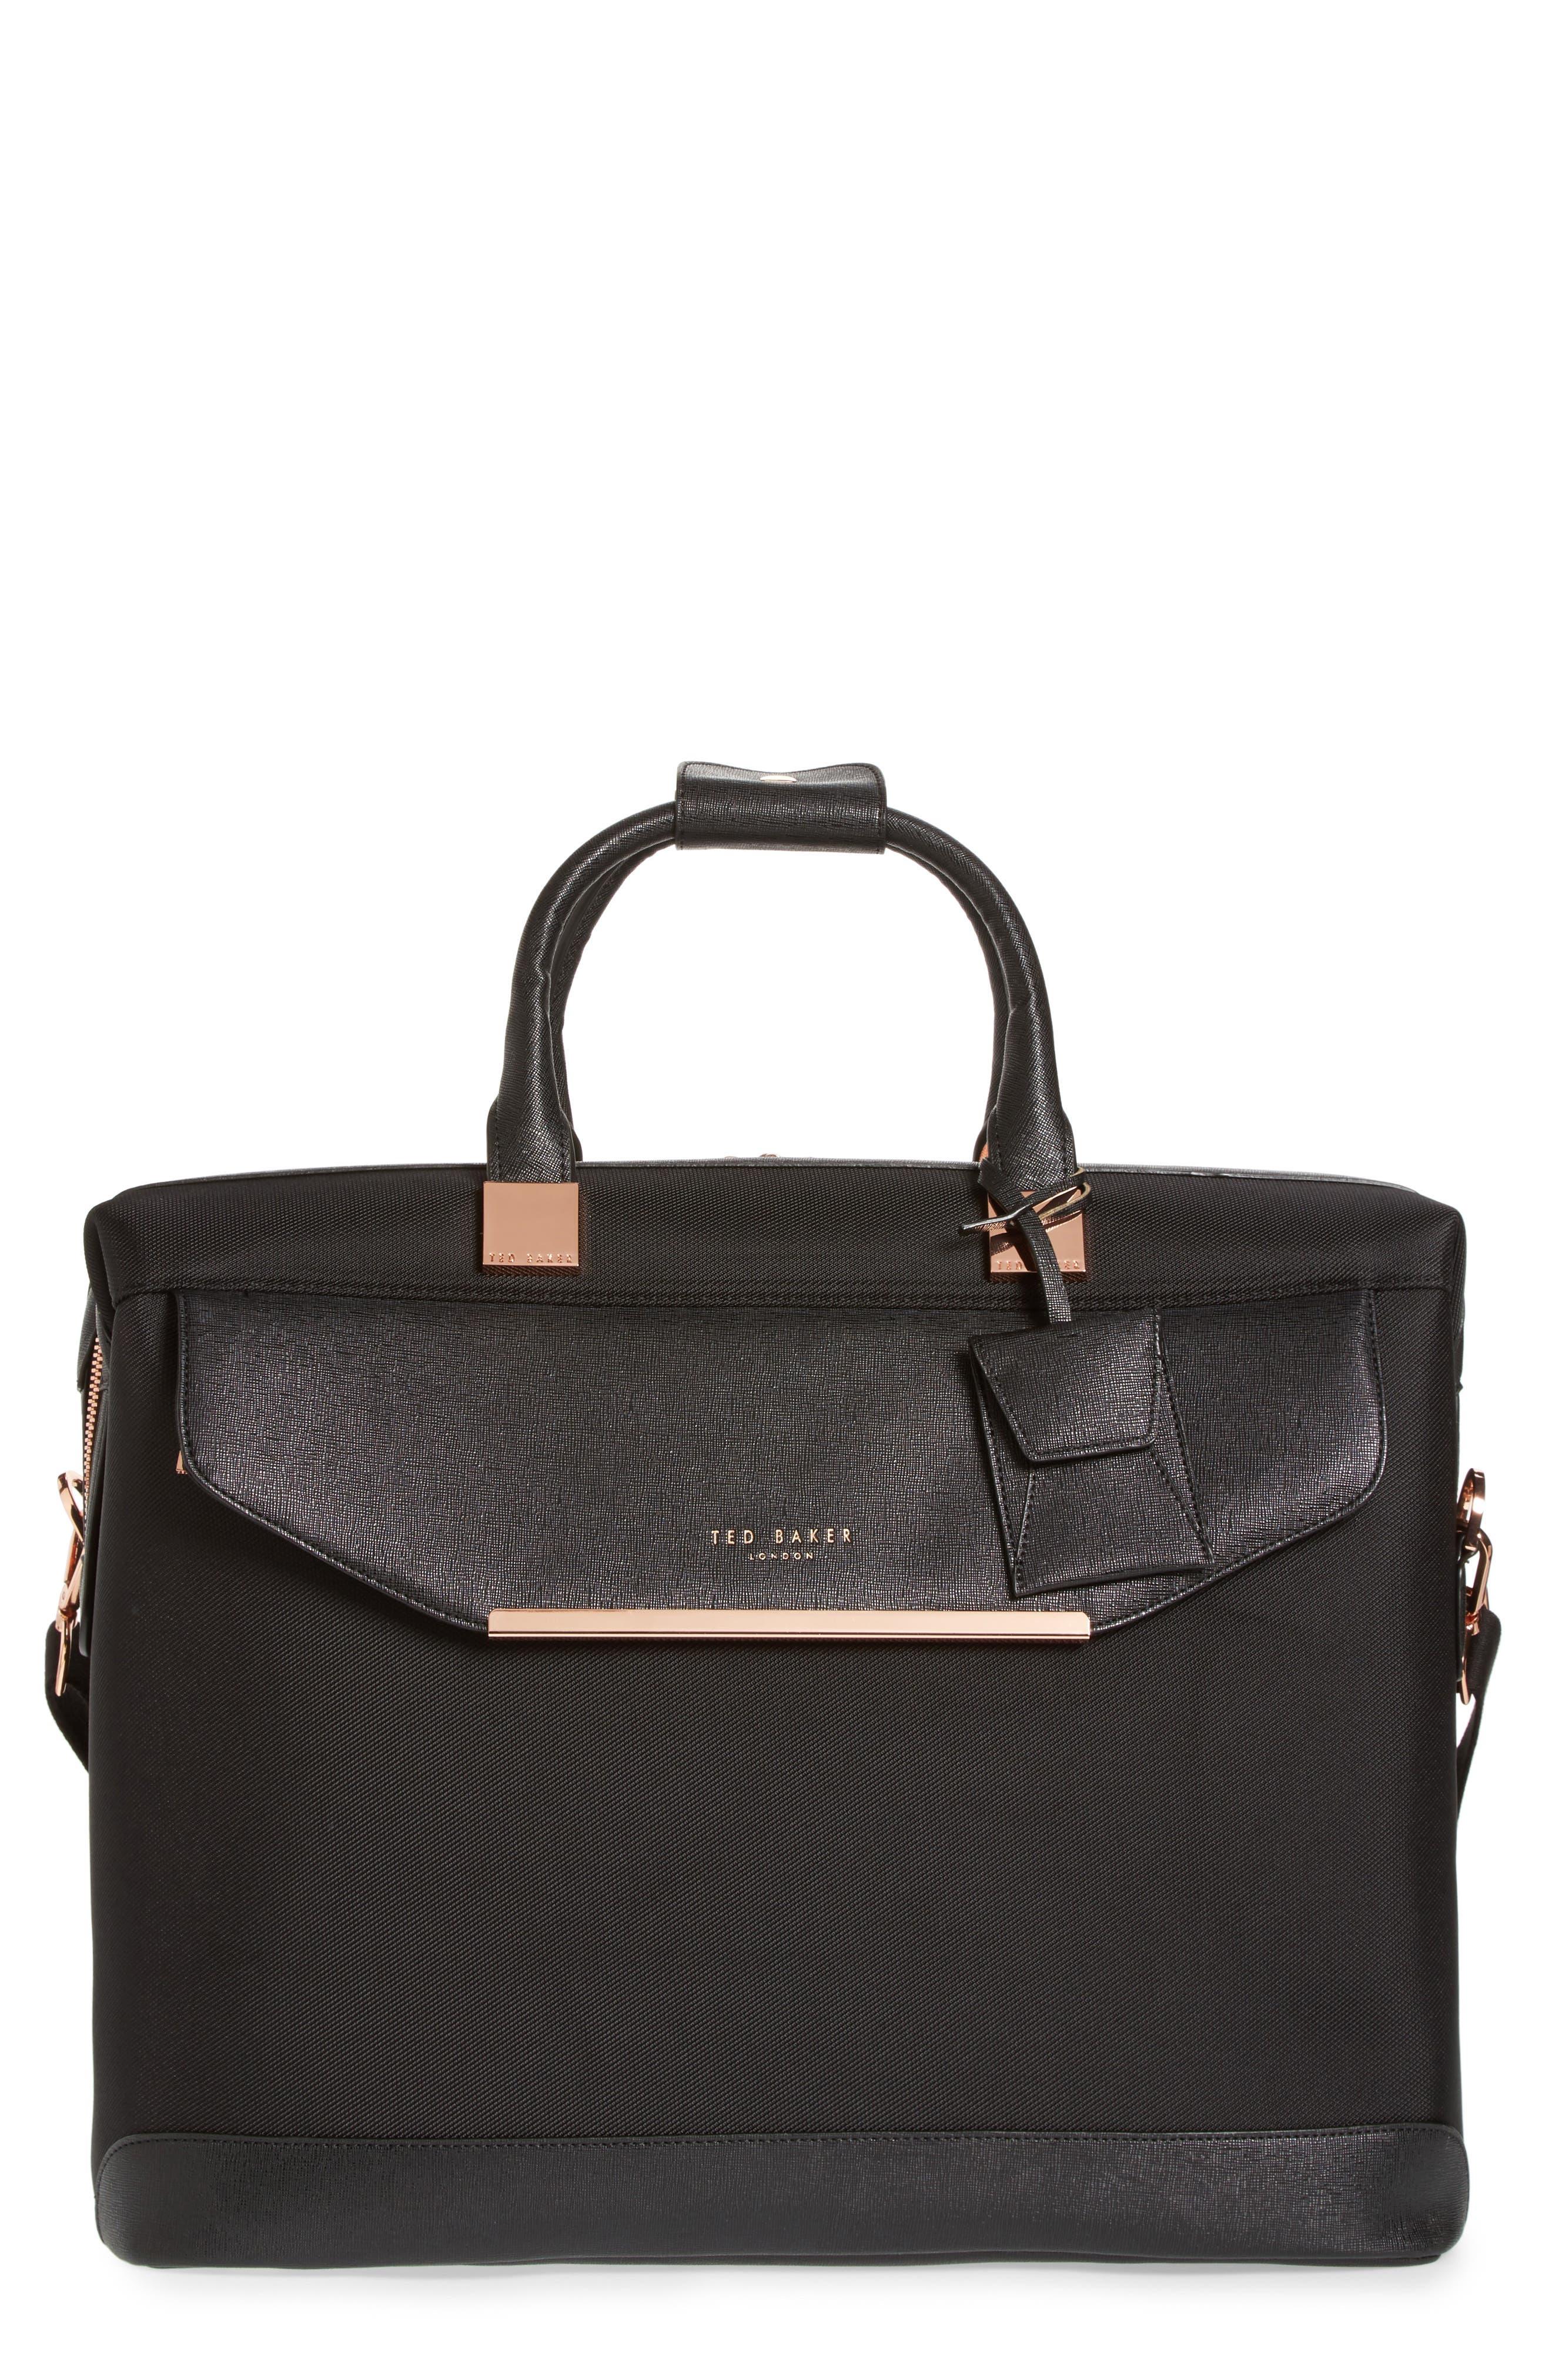 Main Image - Ted Baker London Small Albany Duffel Bag